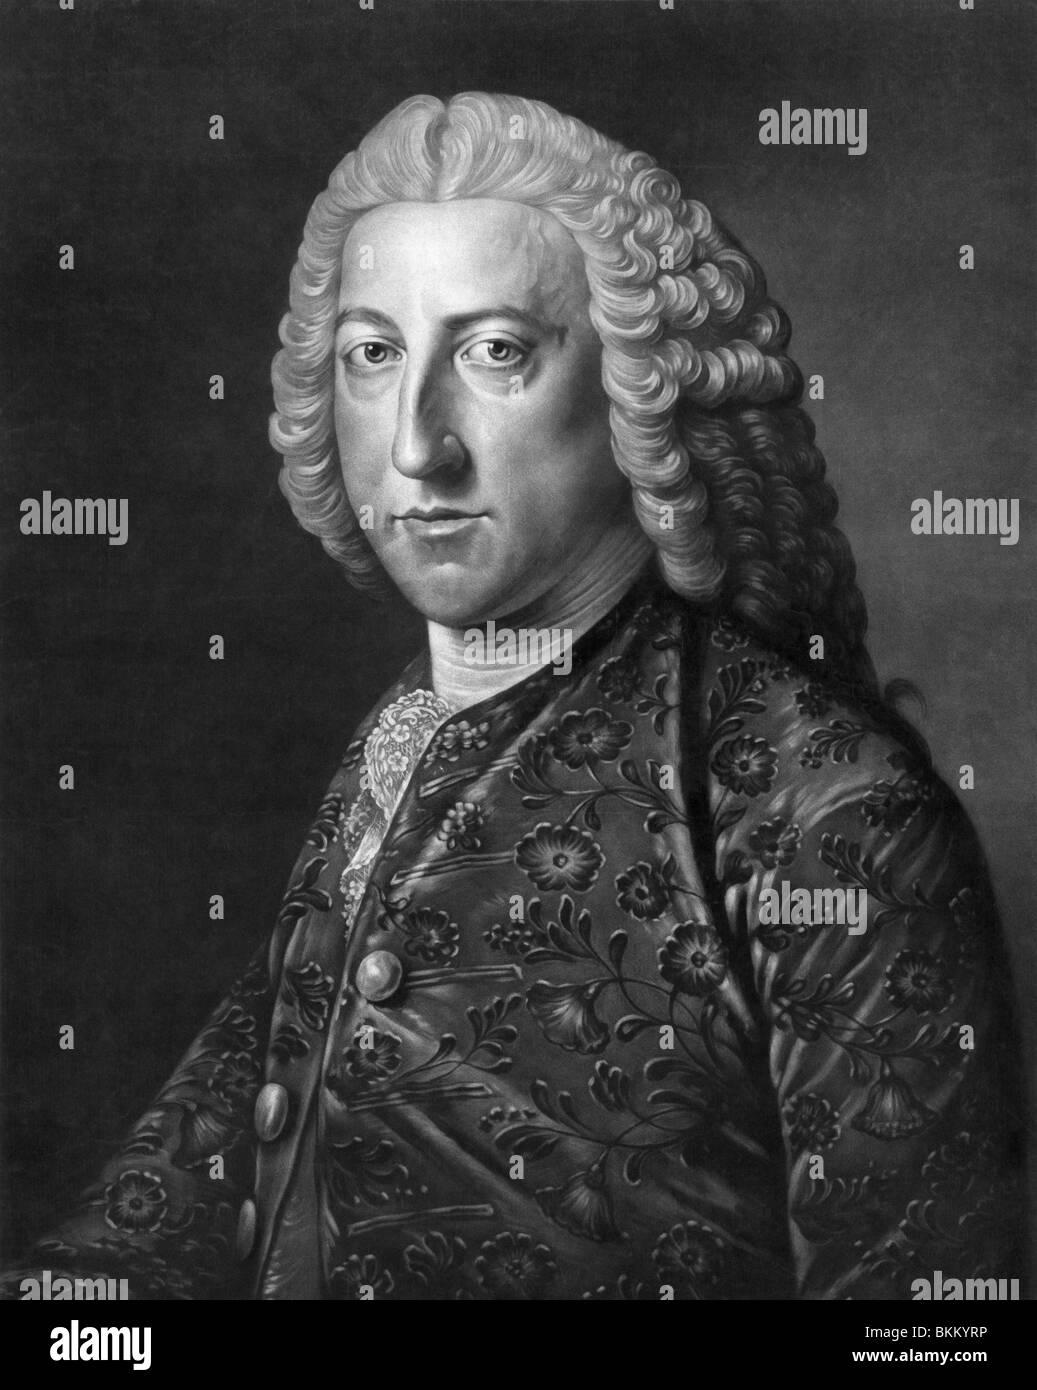 Vintage portrait print c1766 of William Pitt The Elder (1708 - 1778), 1st Earl of Chatham - British Prime Minister - Stock Image